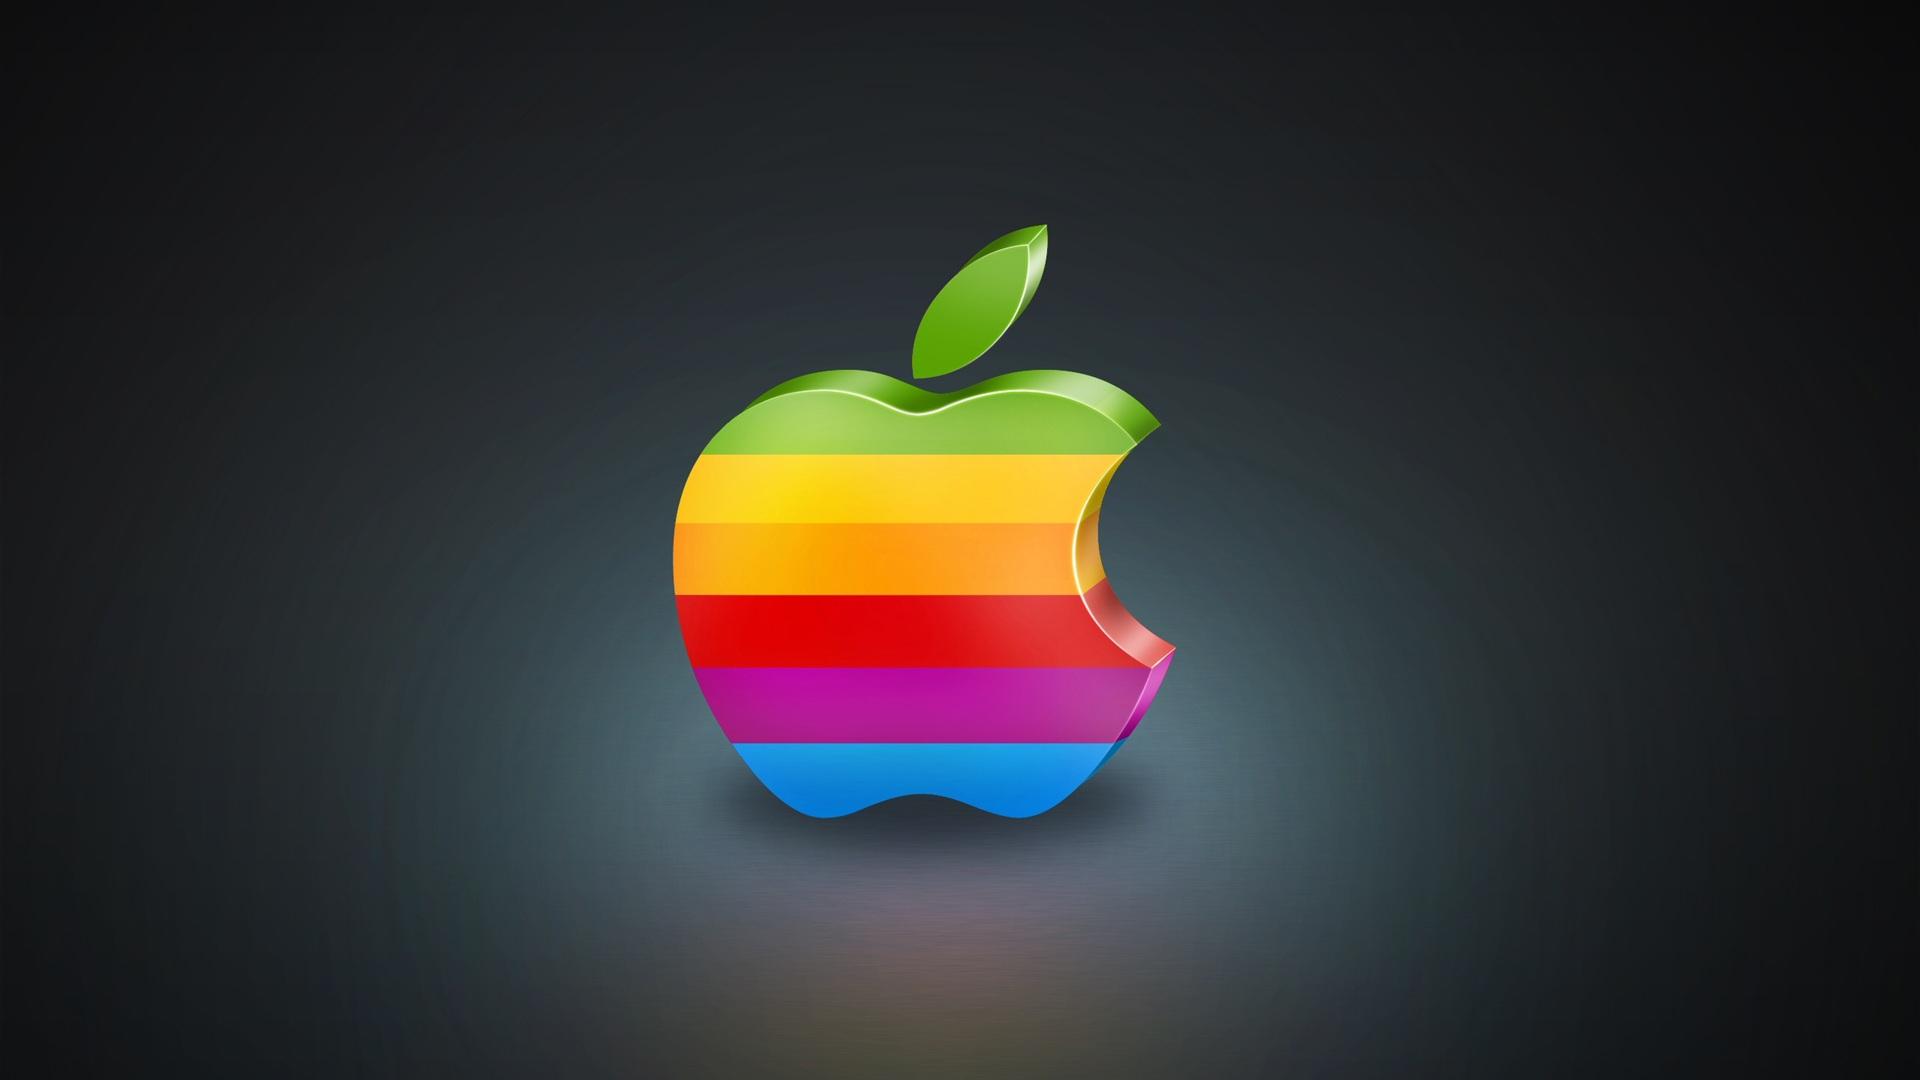 Download hintergrundbilder 1920x1080 full hd 3d bunte for 3d raumgestaltung mac